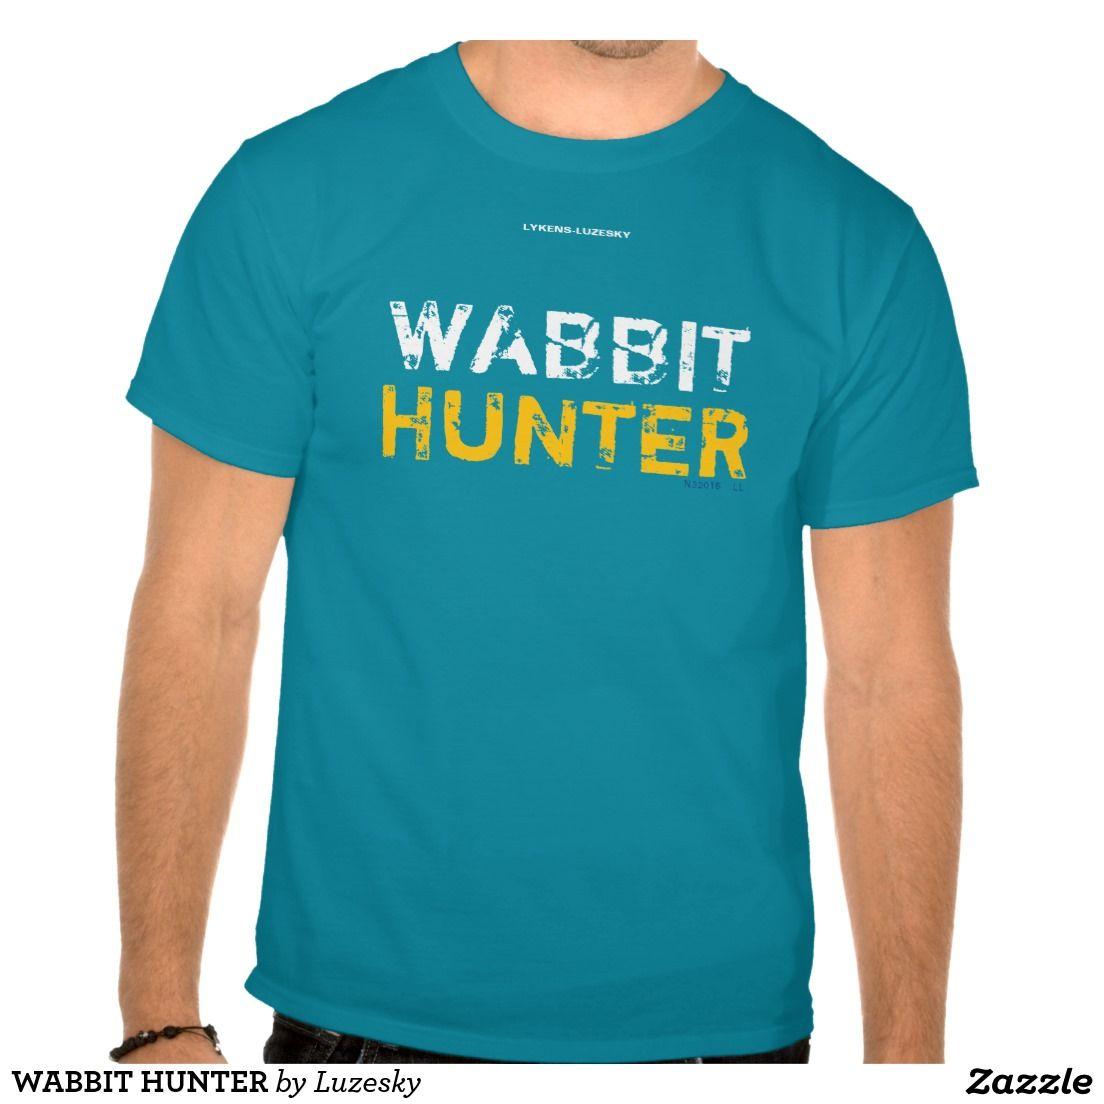 WABBIT HUNTER TSHIRT